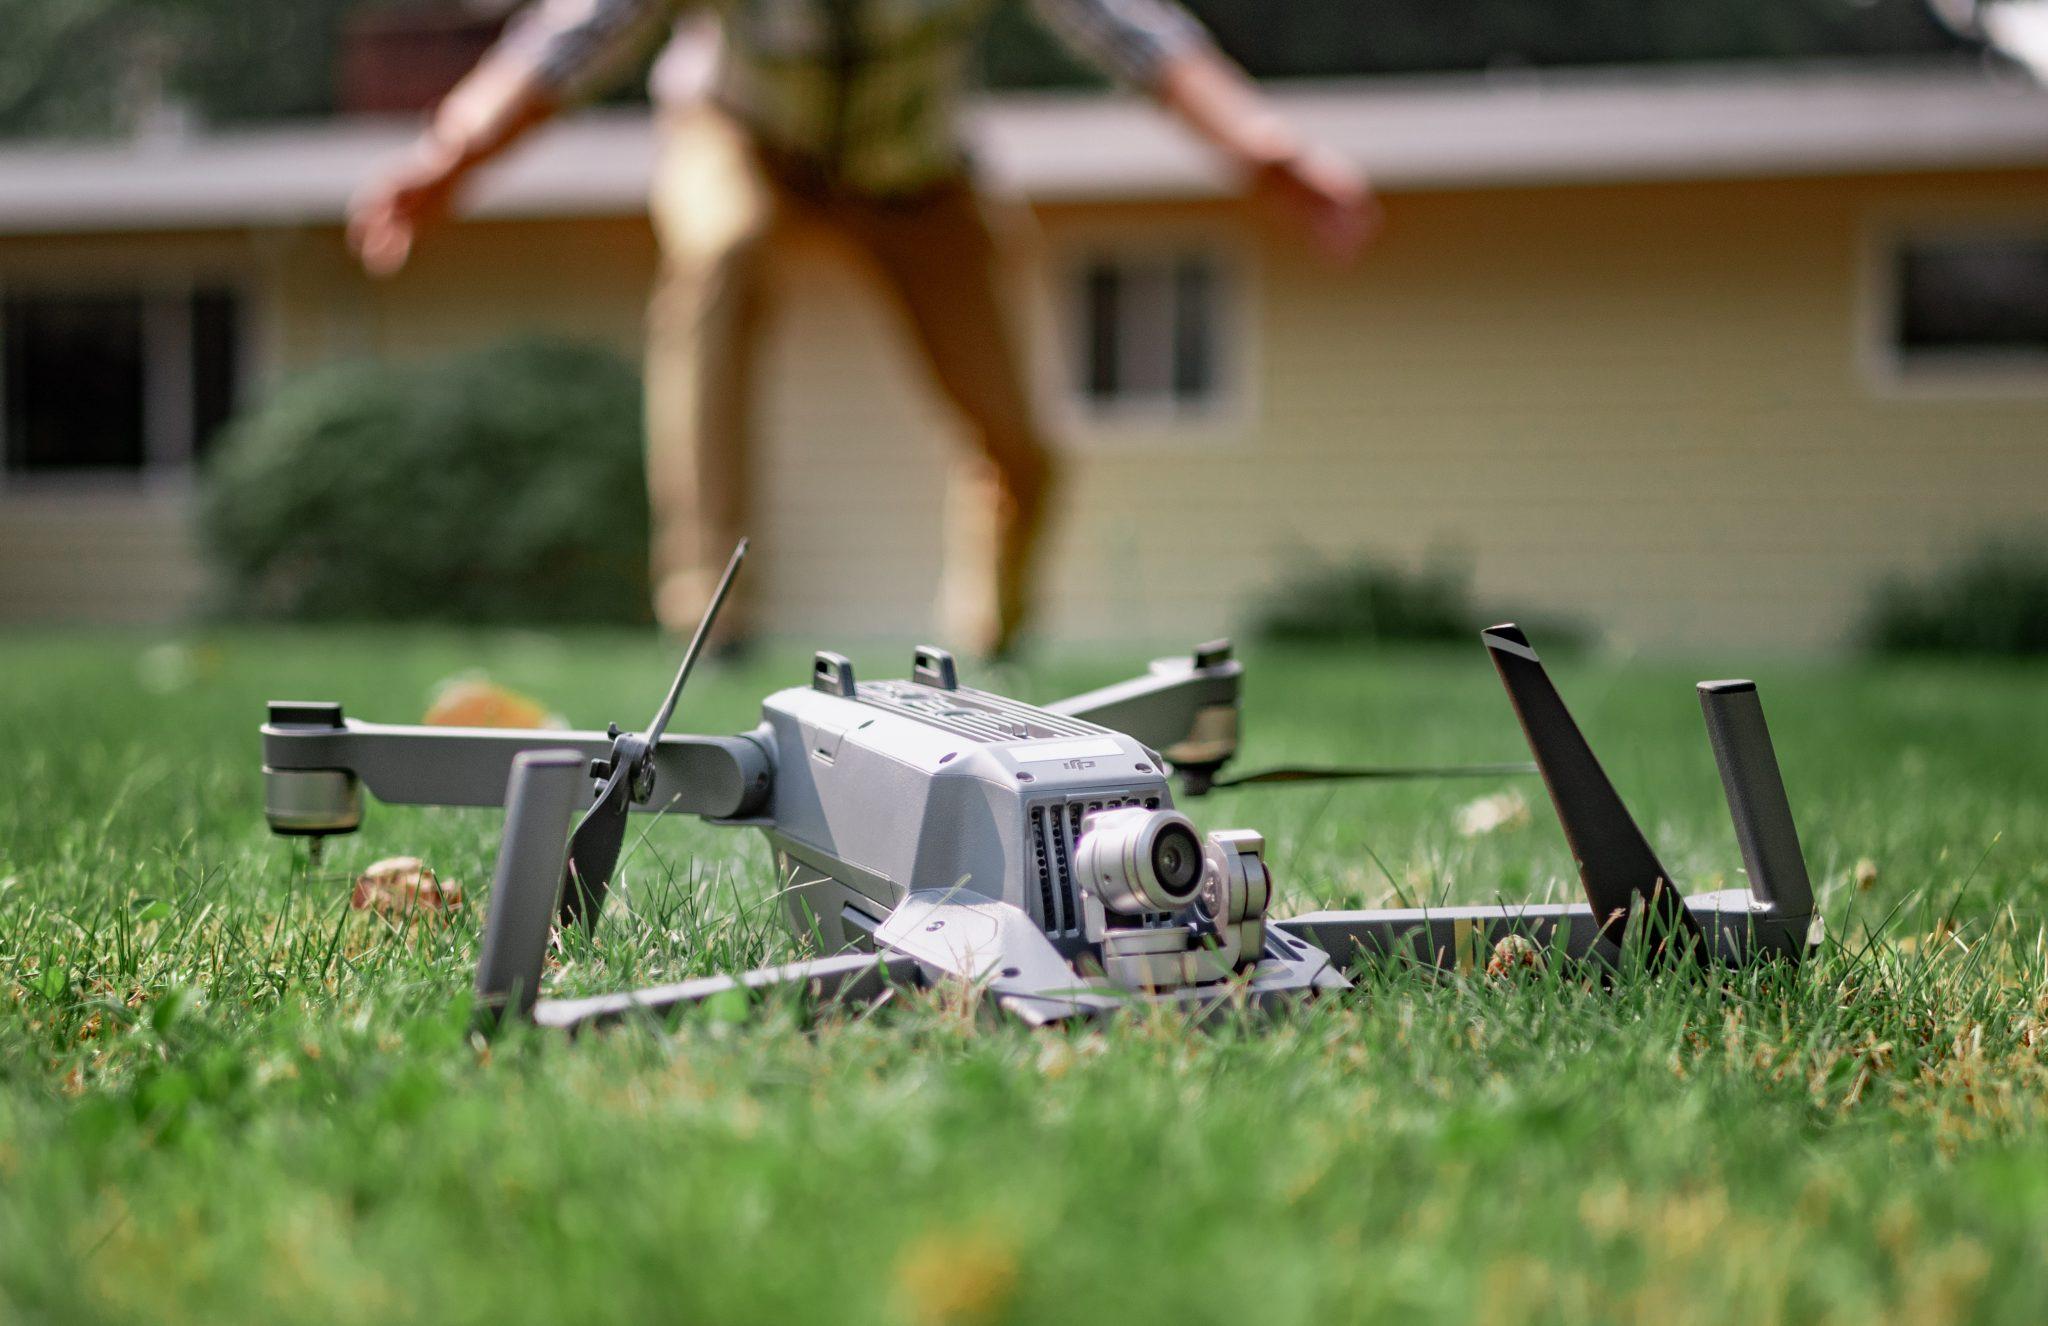 Drone Crash Example